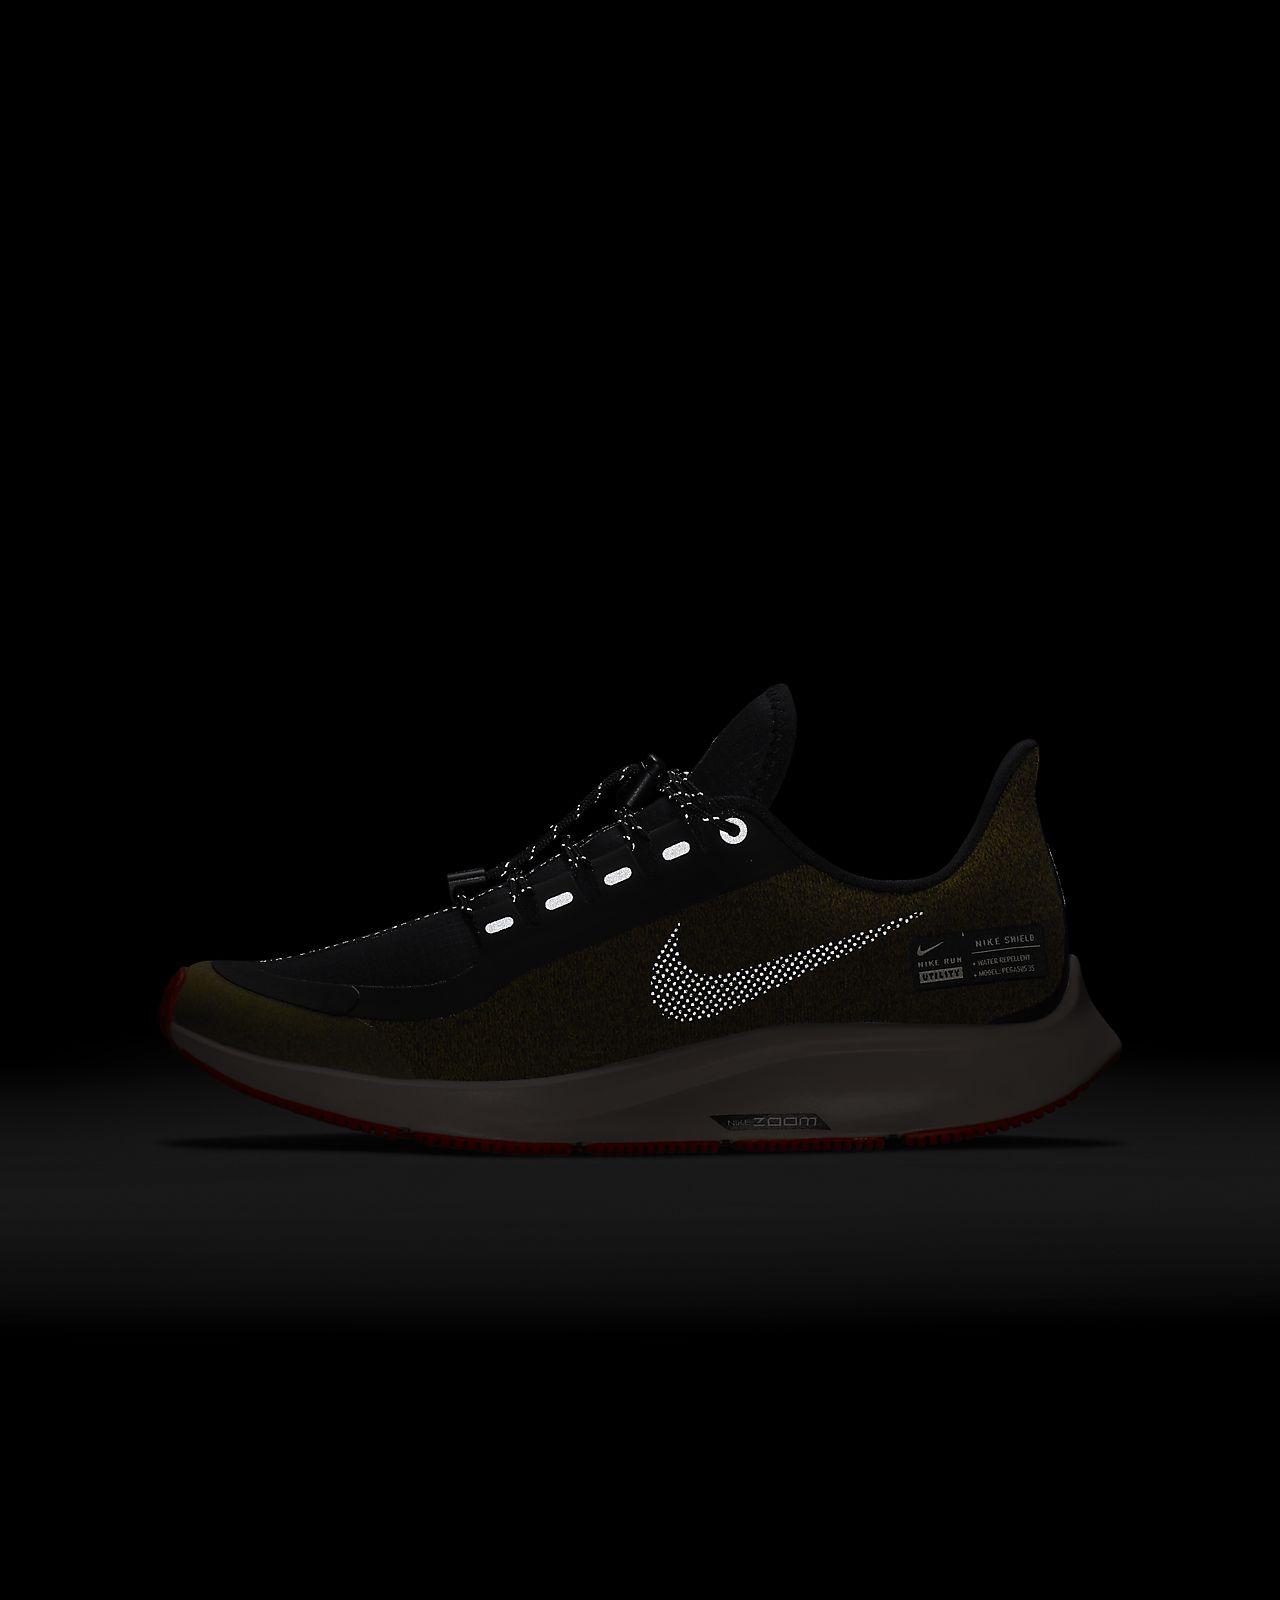 qualité super service style moderne Chaussure Nike